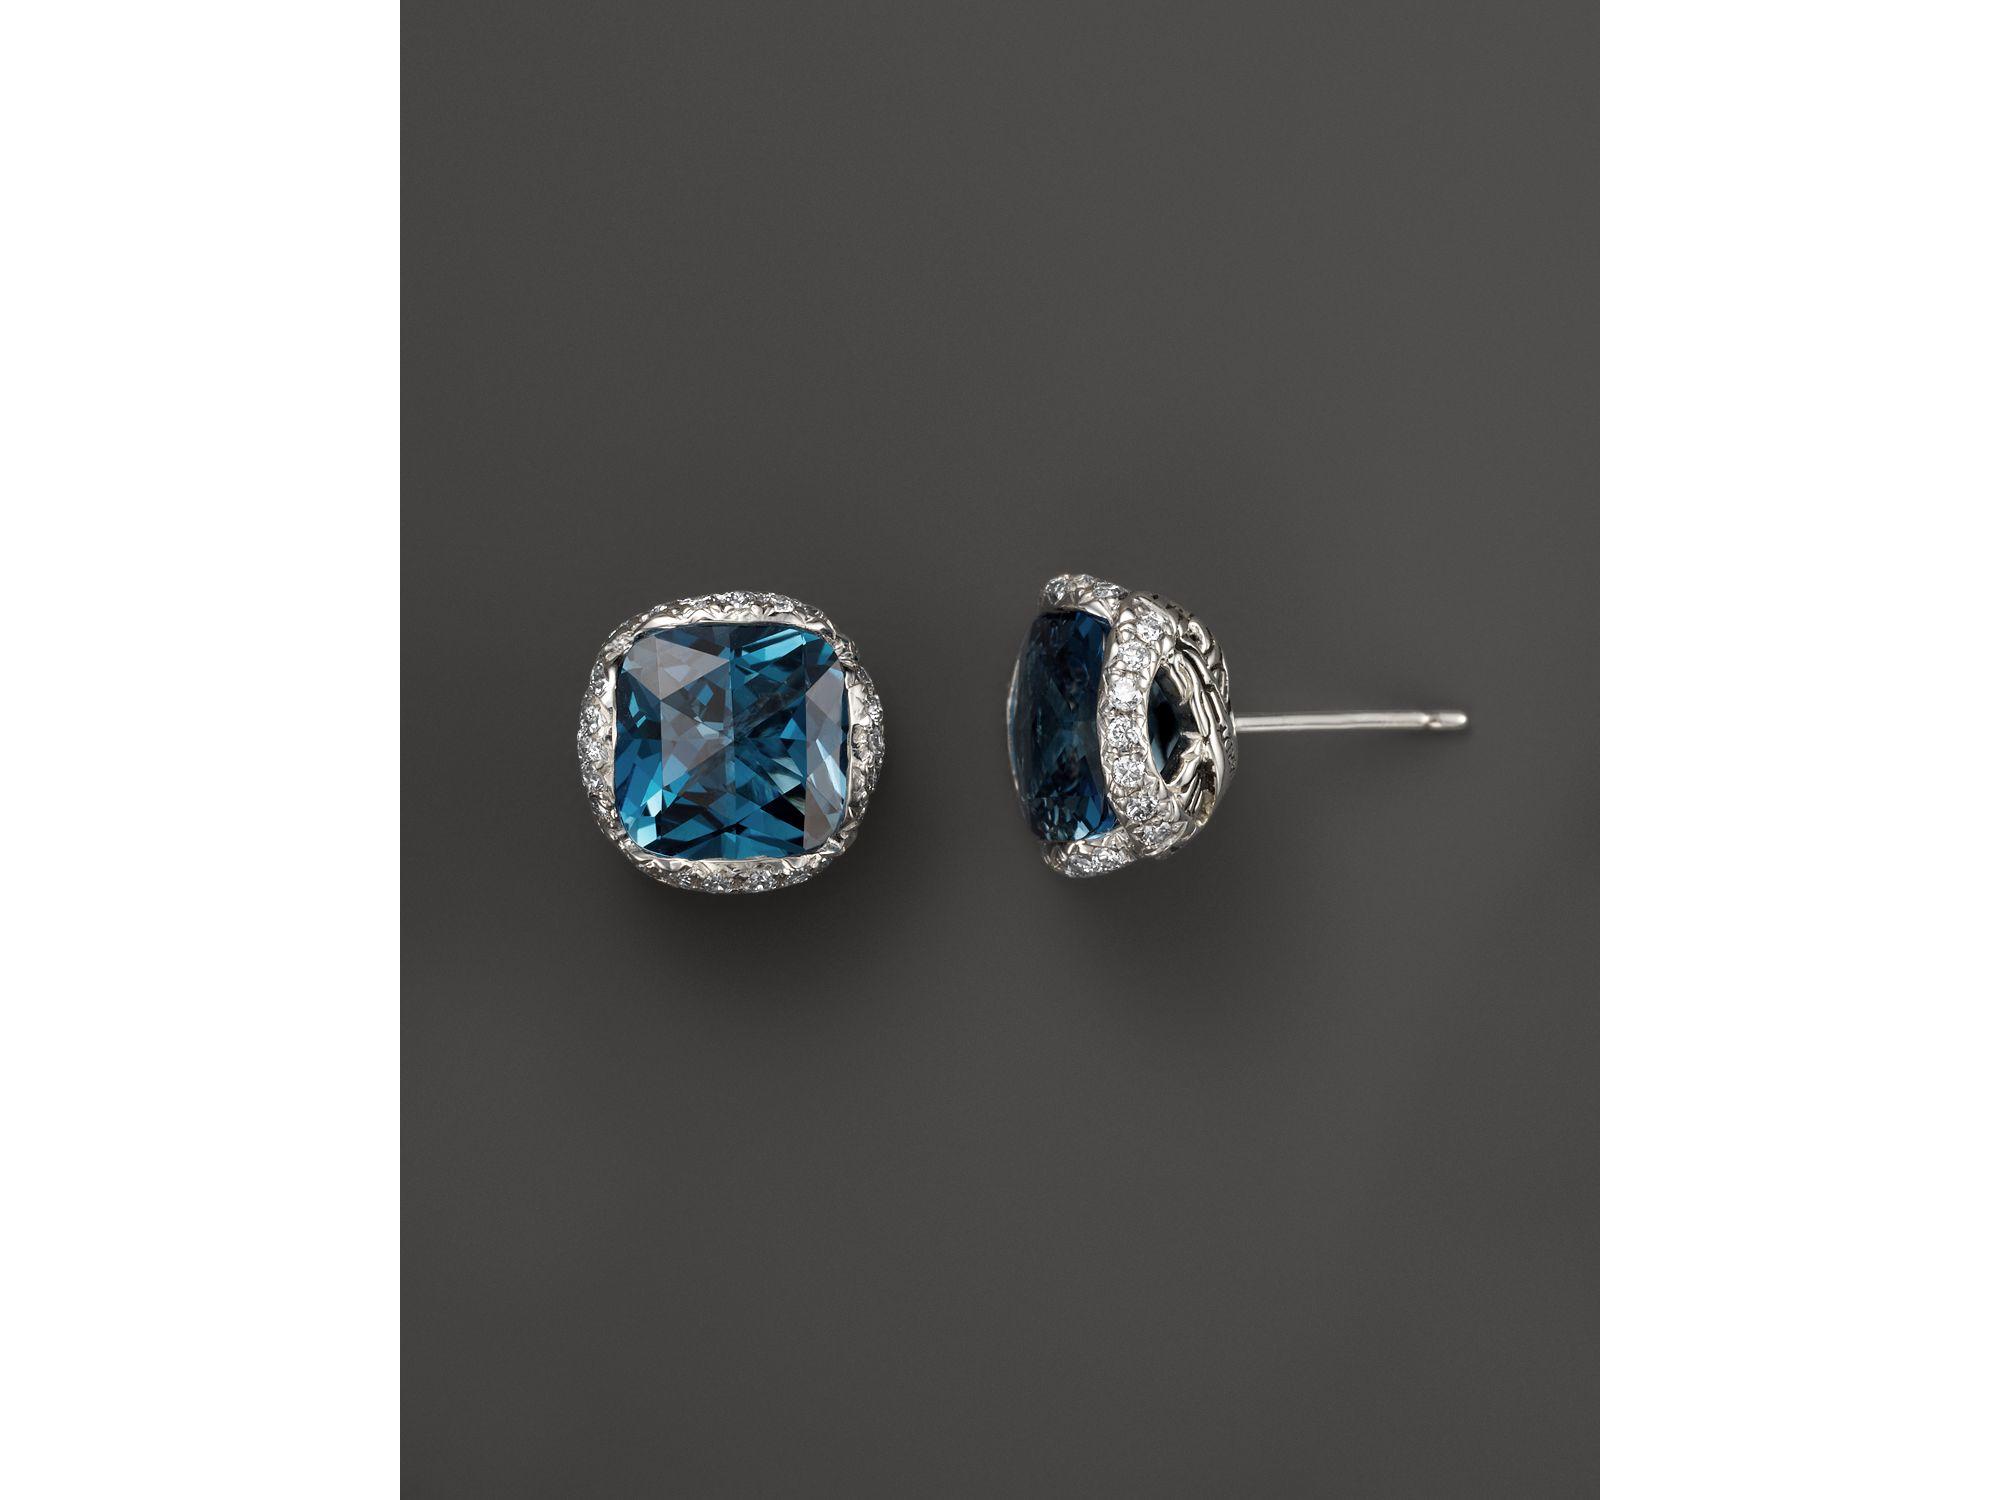 London Topaz Earrings Marco Bicego Murano London Blue Topaz